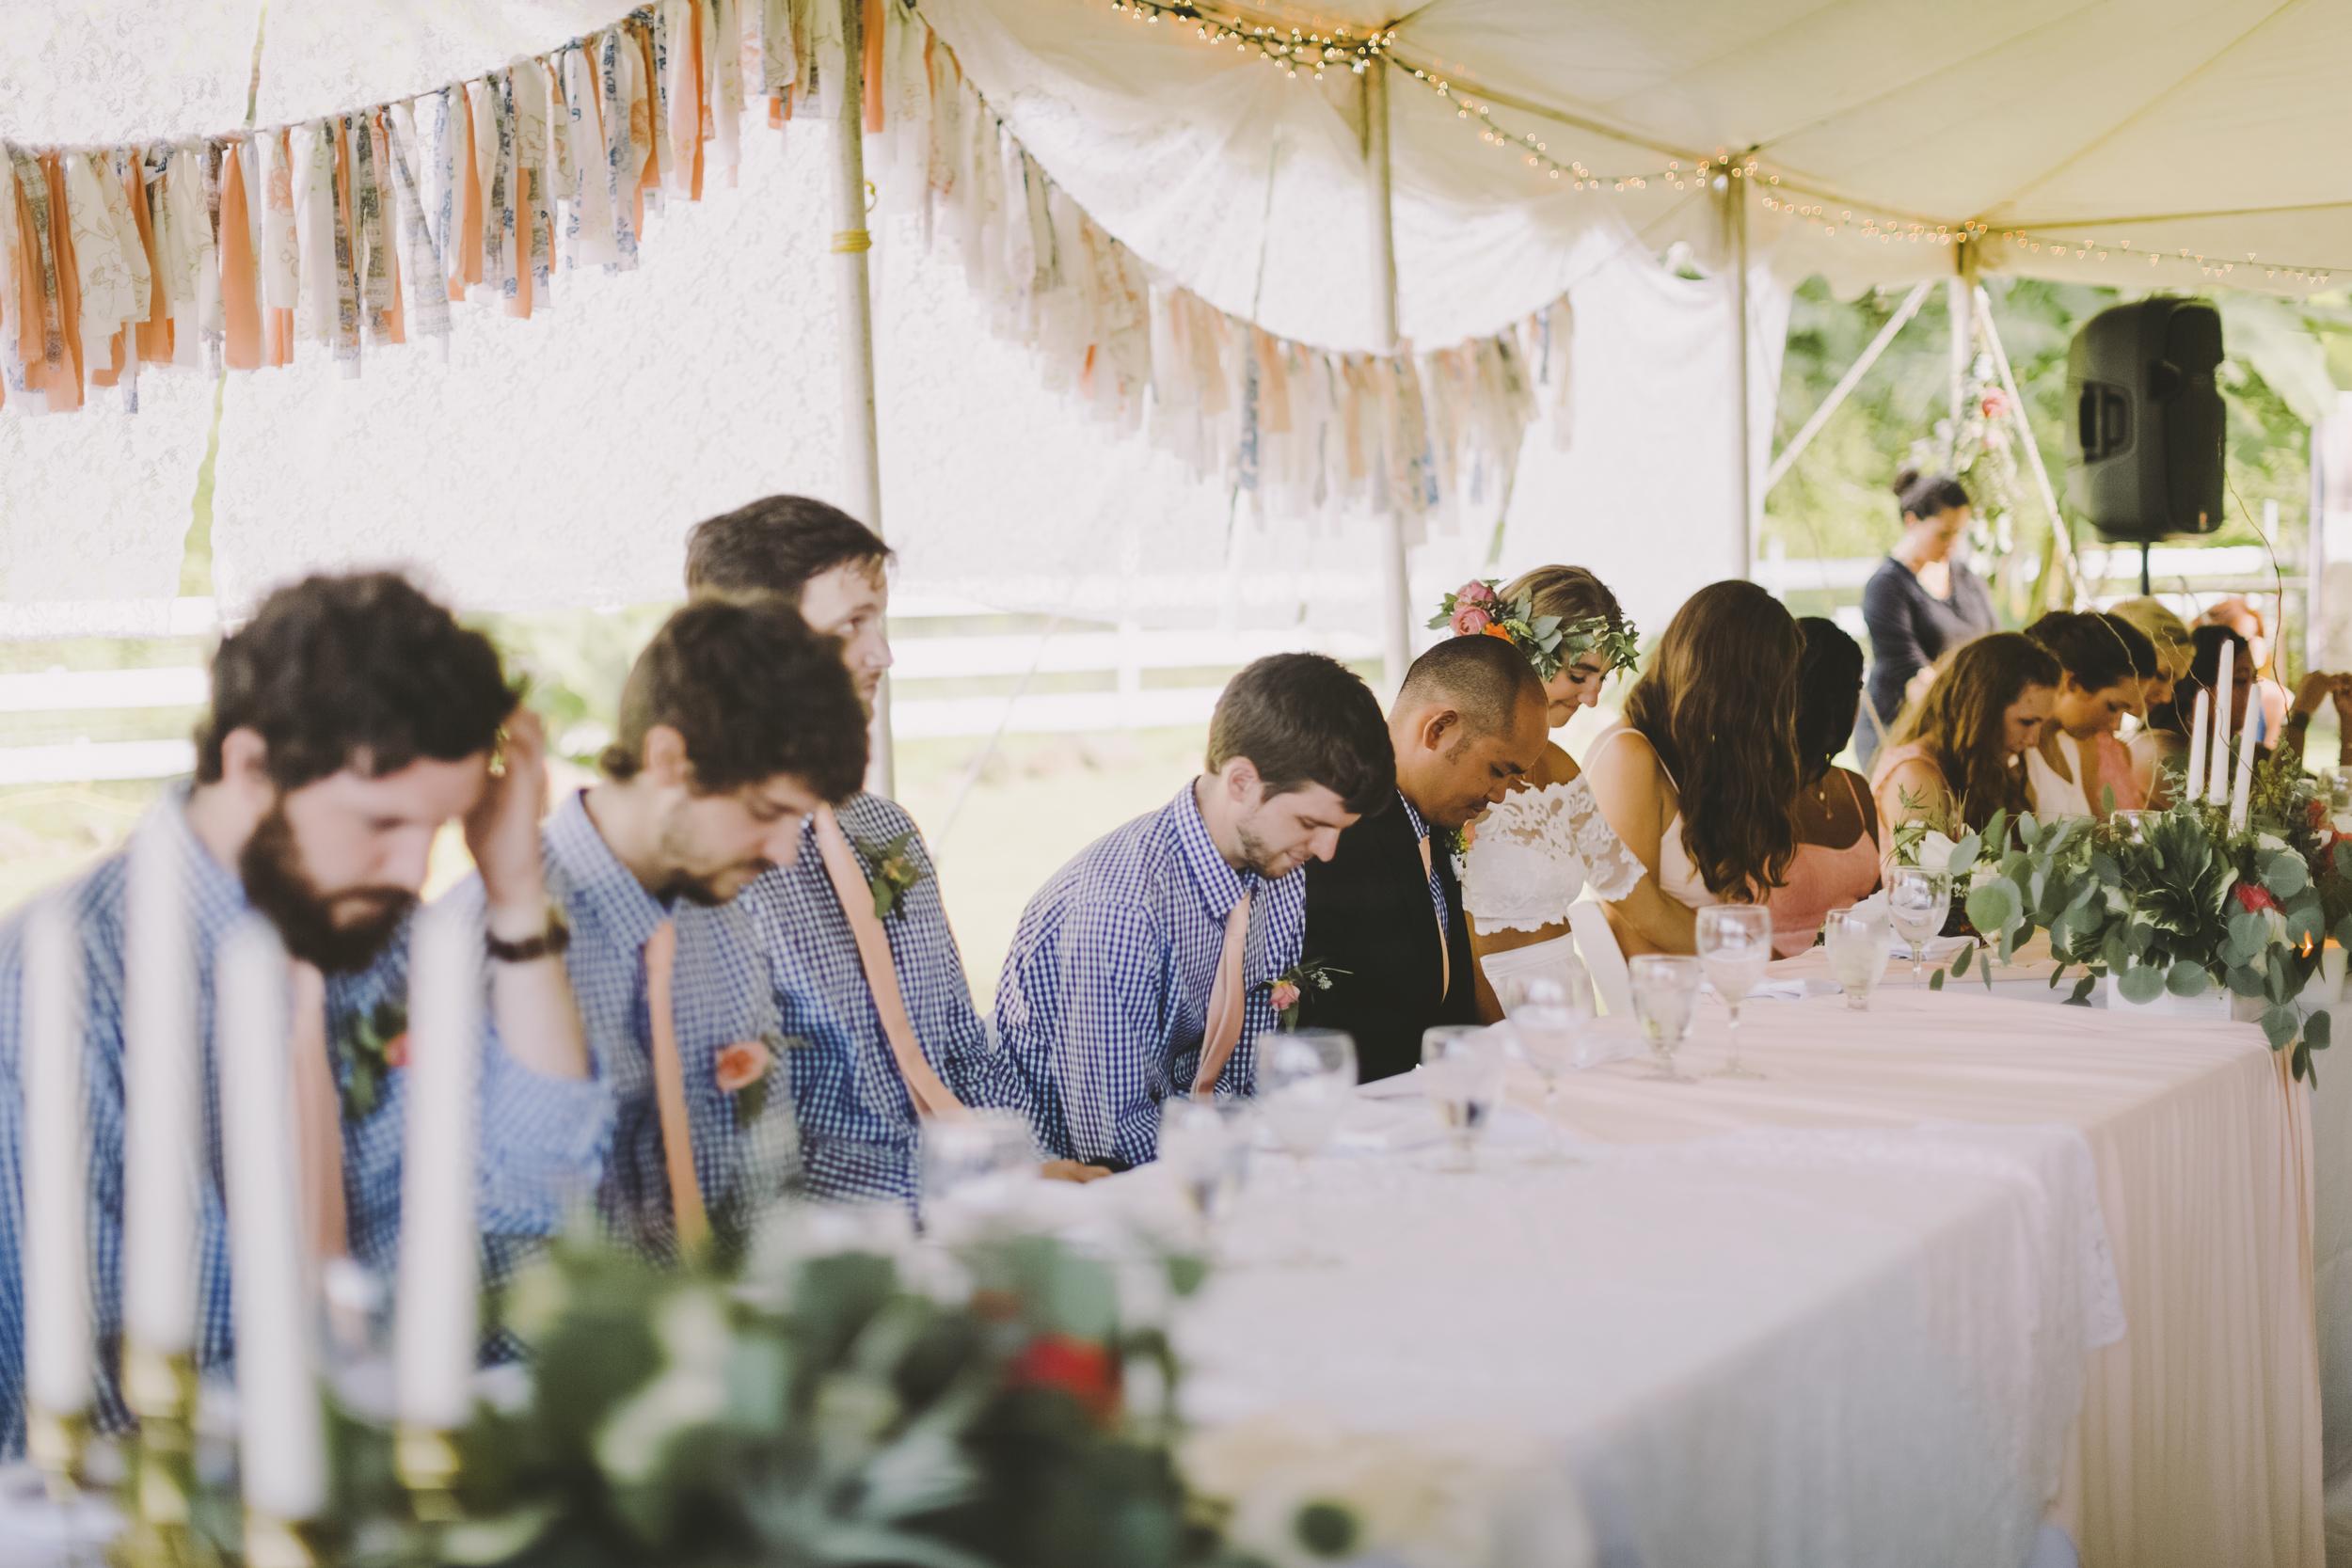 angie-diaz-photography-oahu-hawaii-wedding-tradewinds-ranch-102.jpg